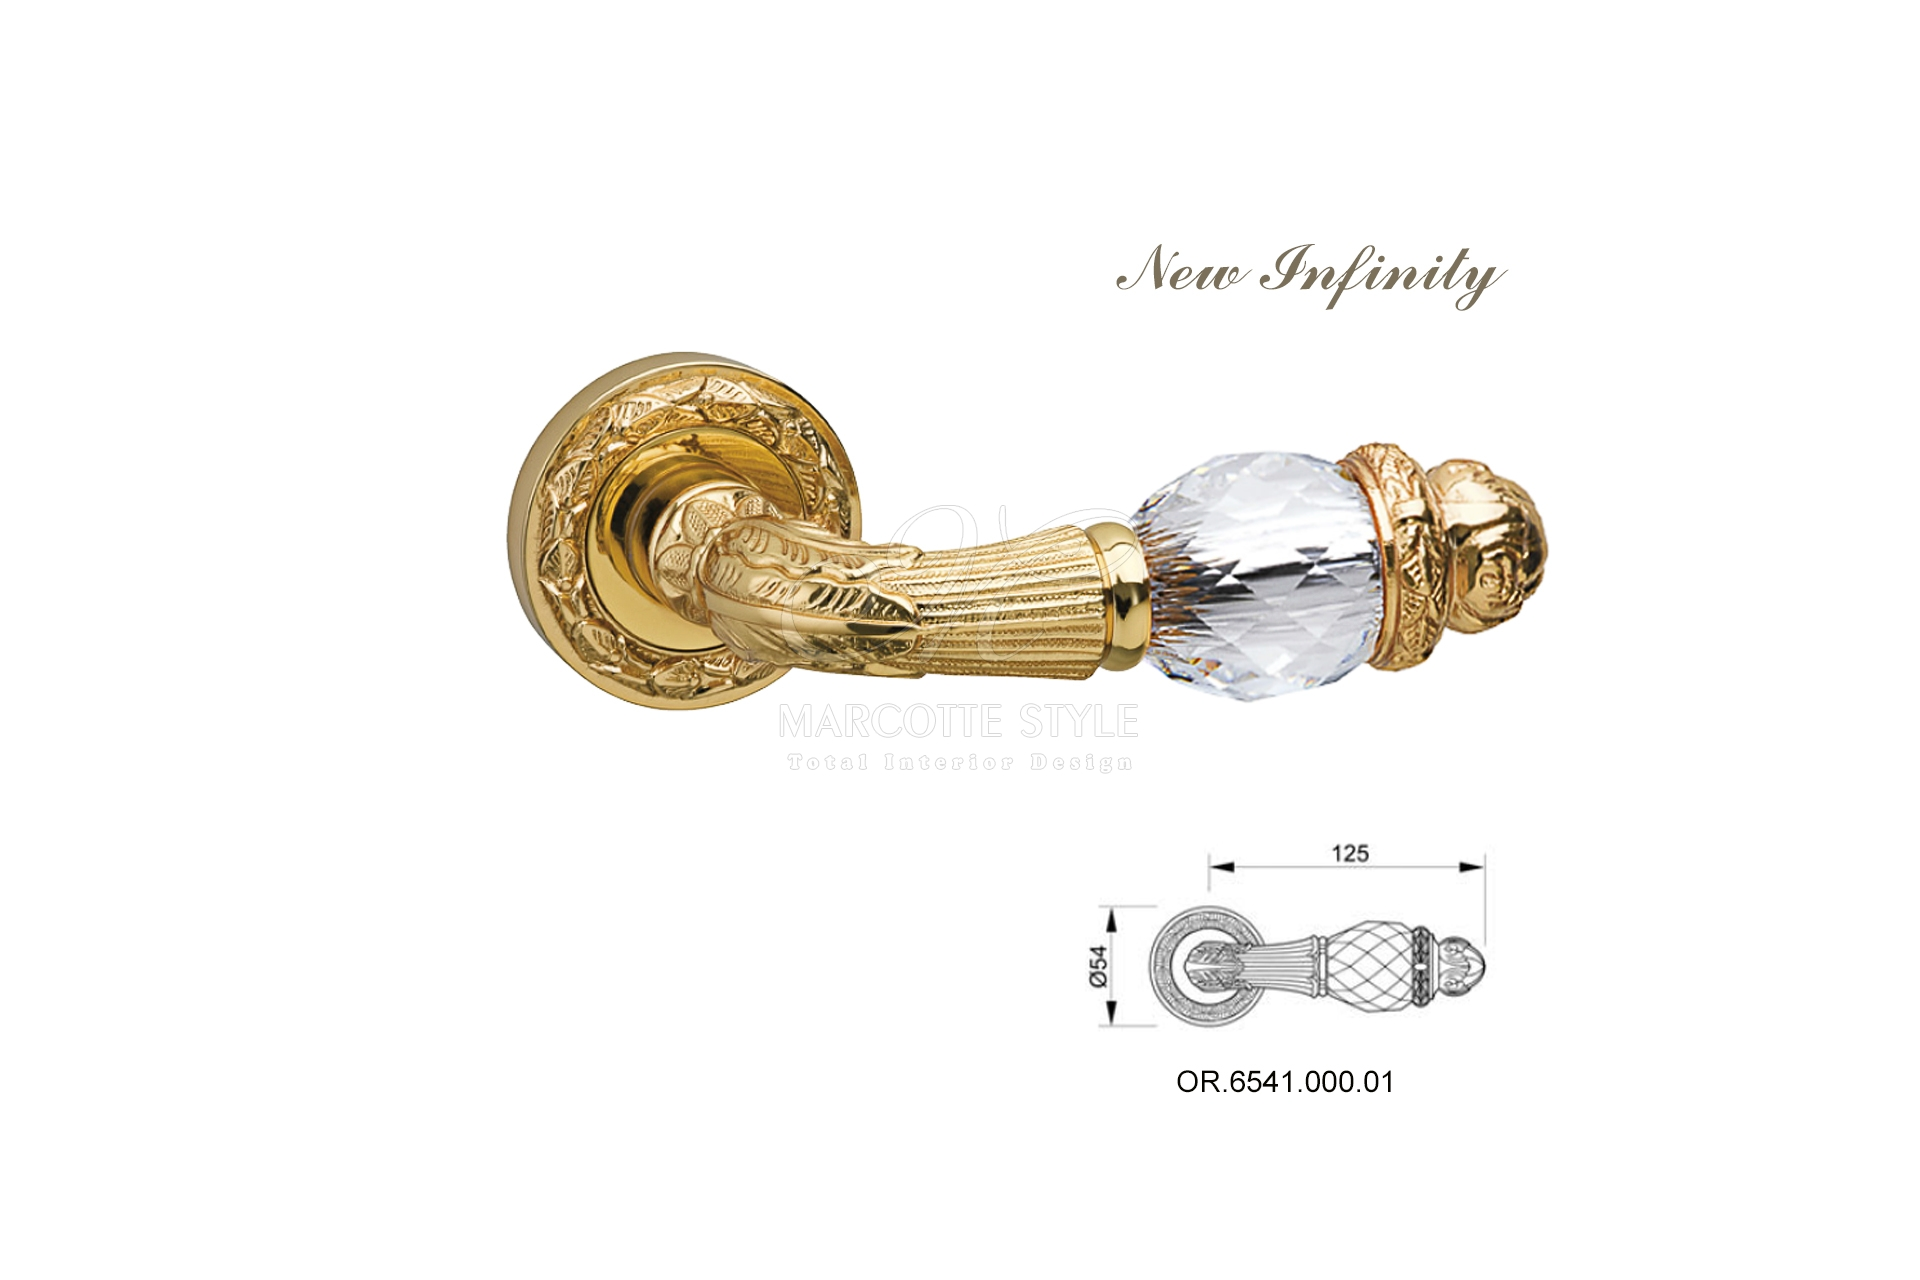 Weelderige gouden klinken marcotte style